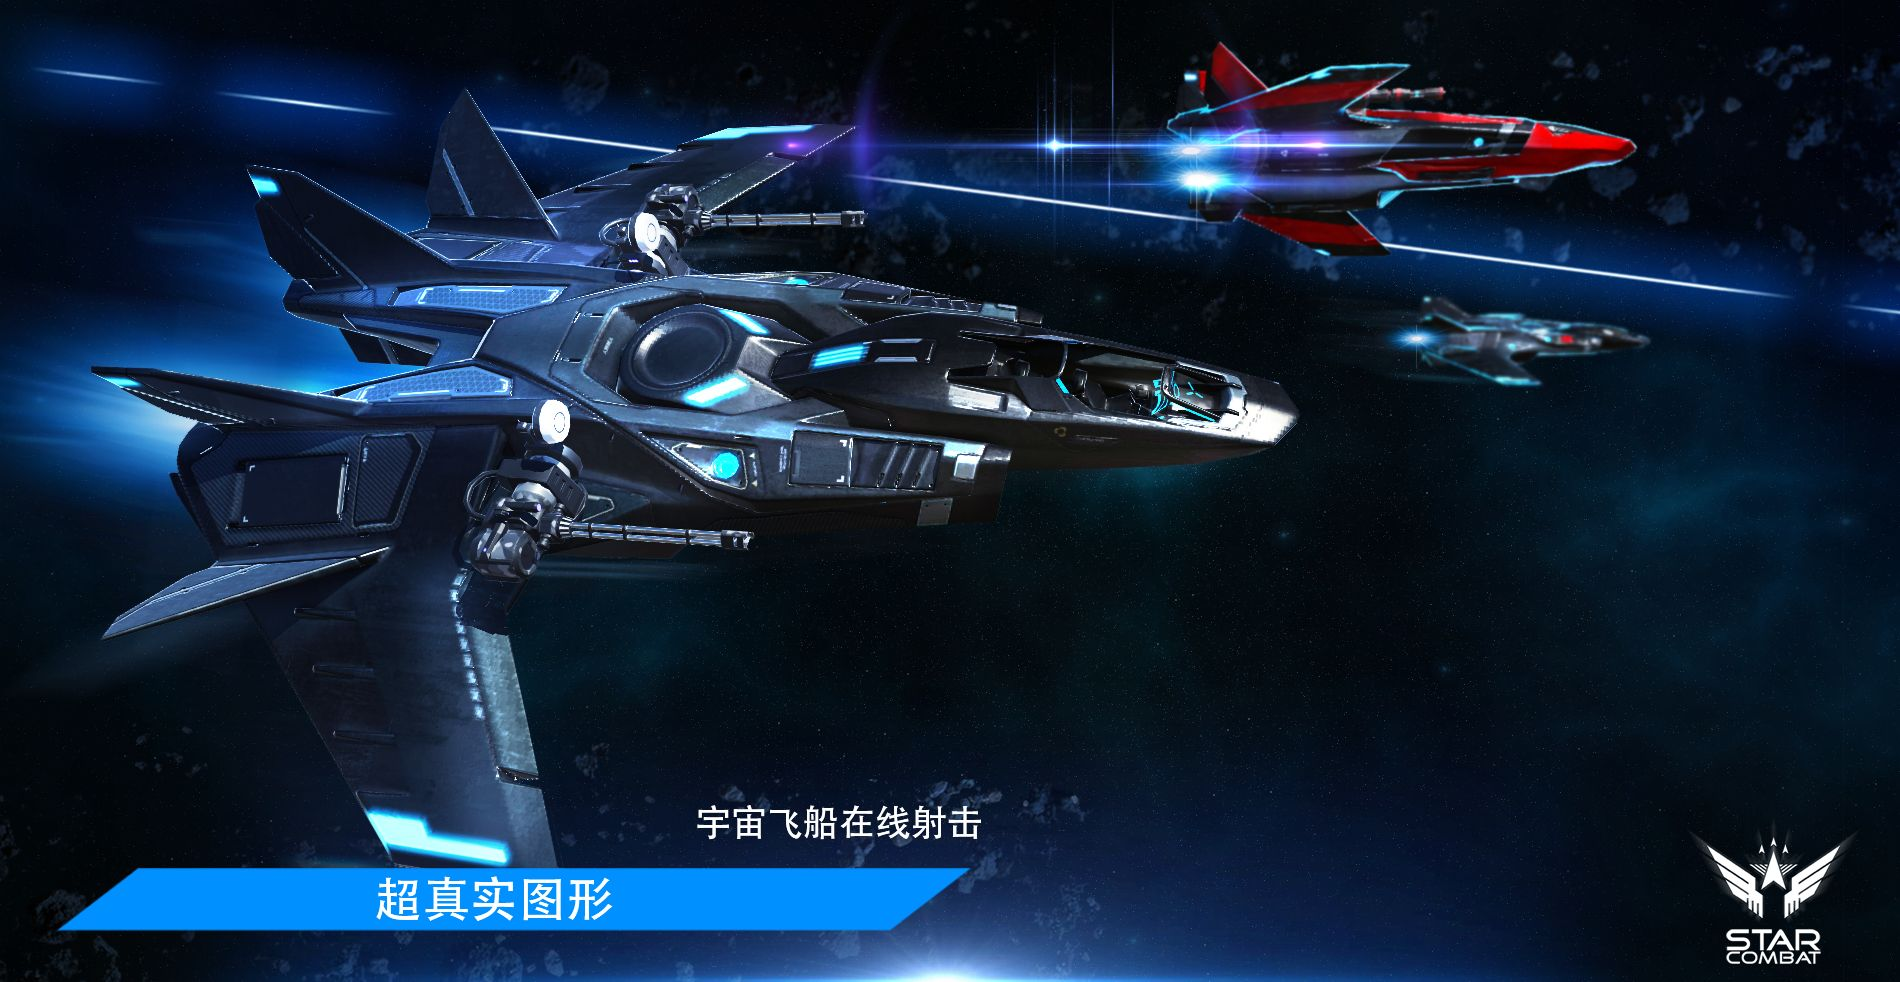 Star Combat 游戏截图1